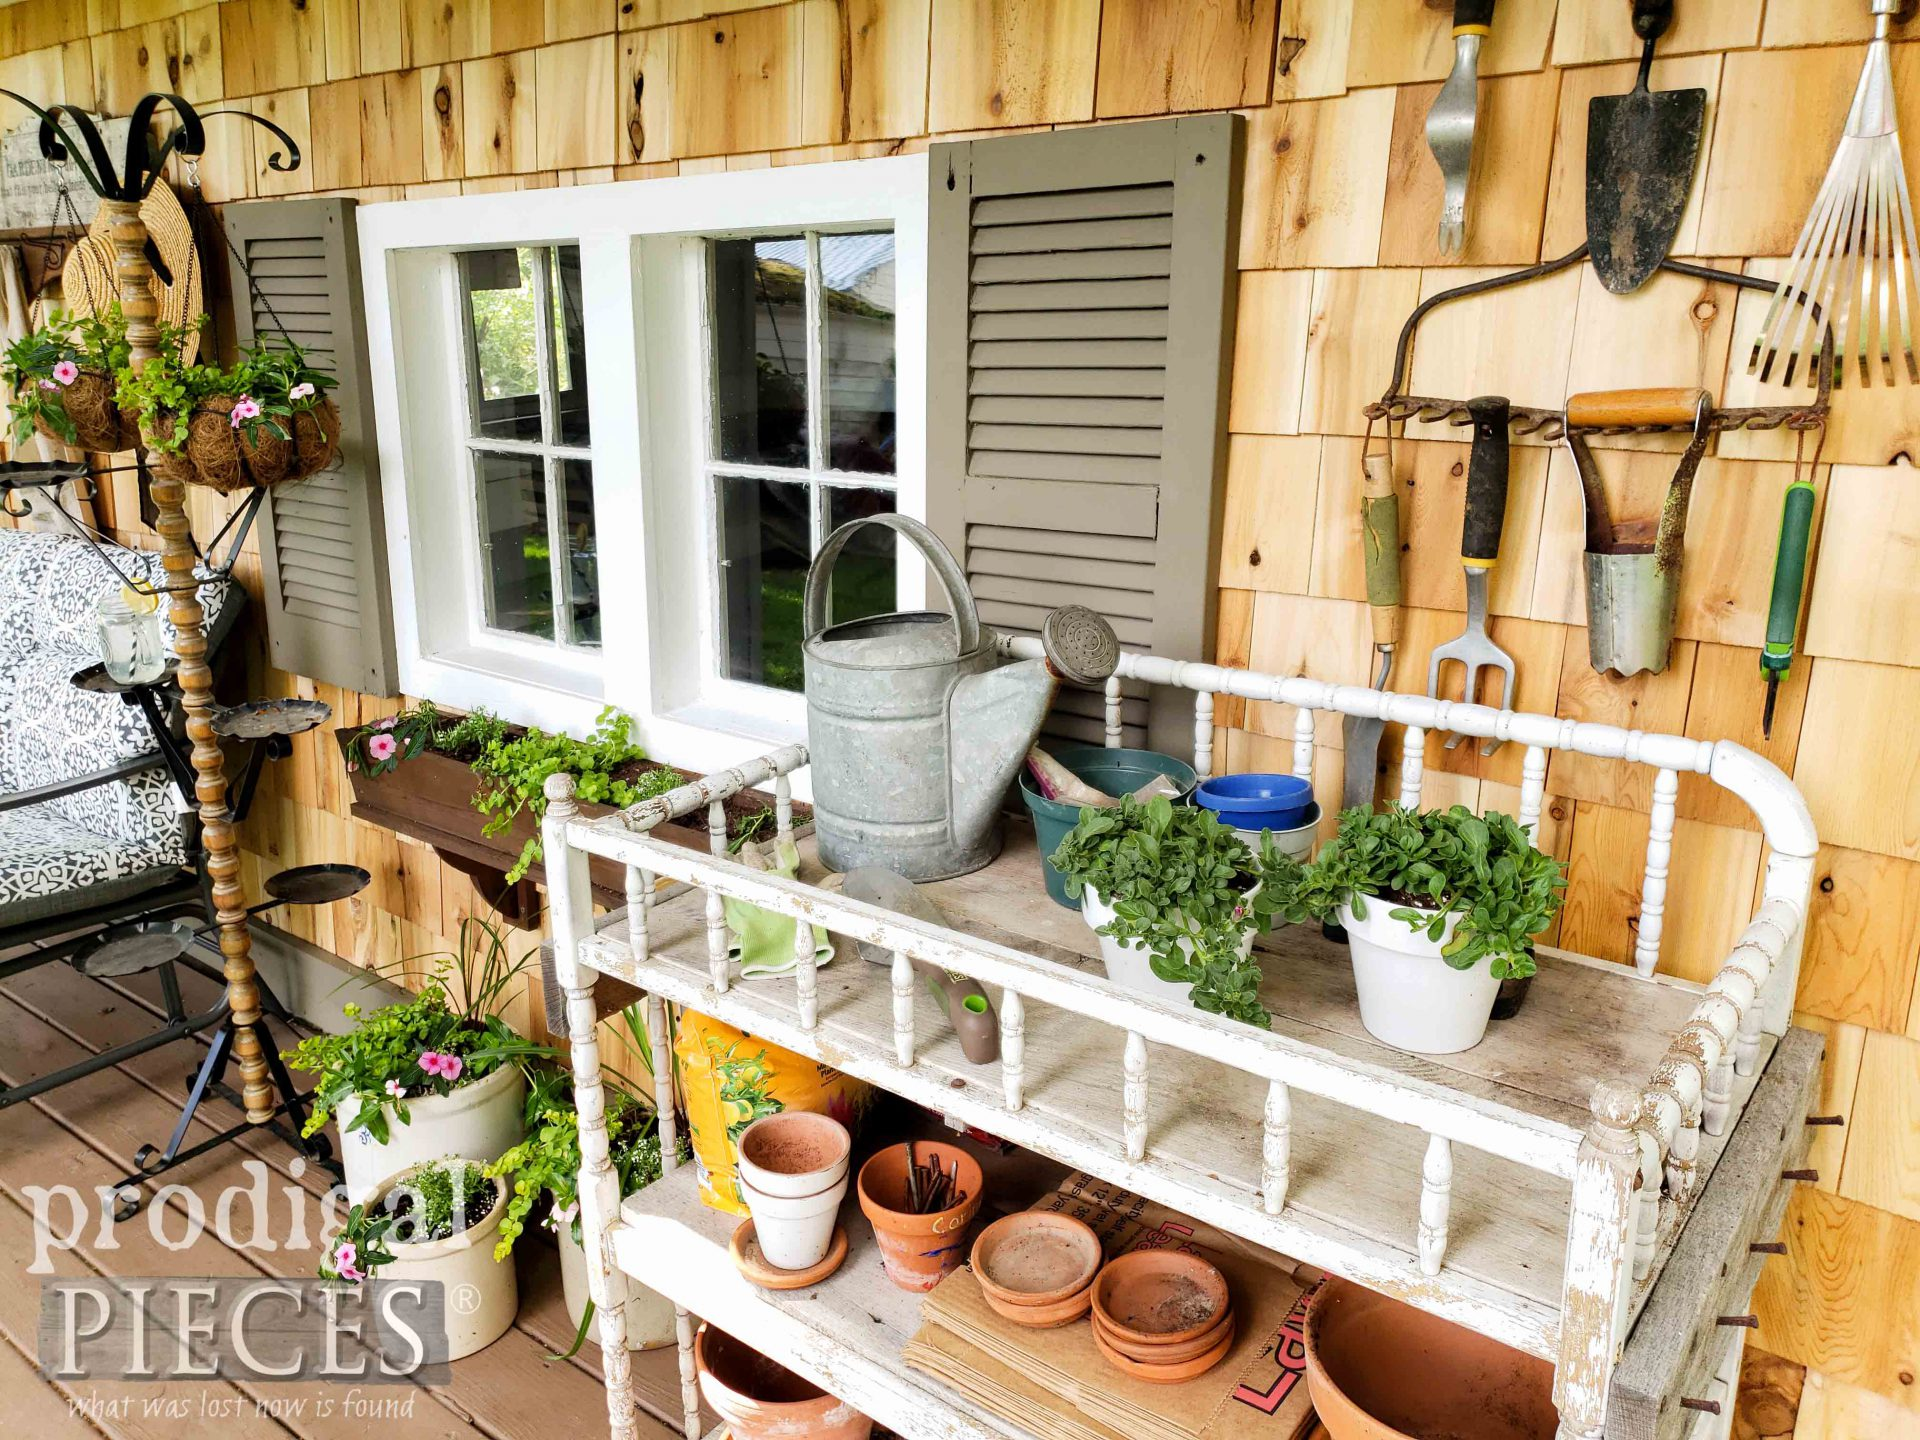 Farmhouse DIY Garden Shed Remodel by Prodigal Pieces | prodigalpieces.com #prodigalpieces #diy #home #homedecor #garden